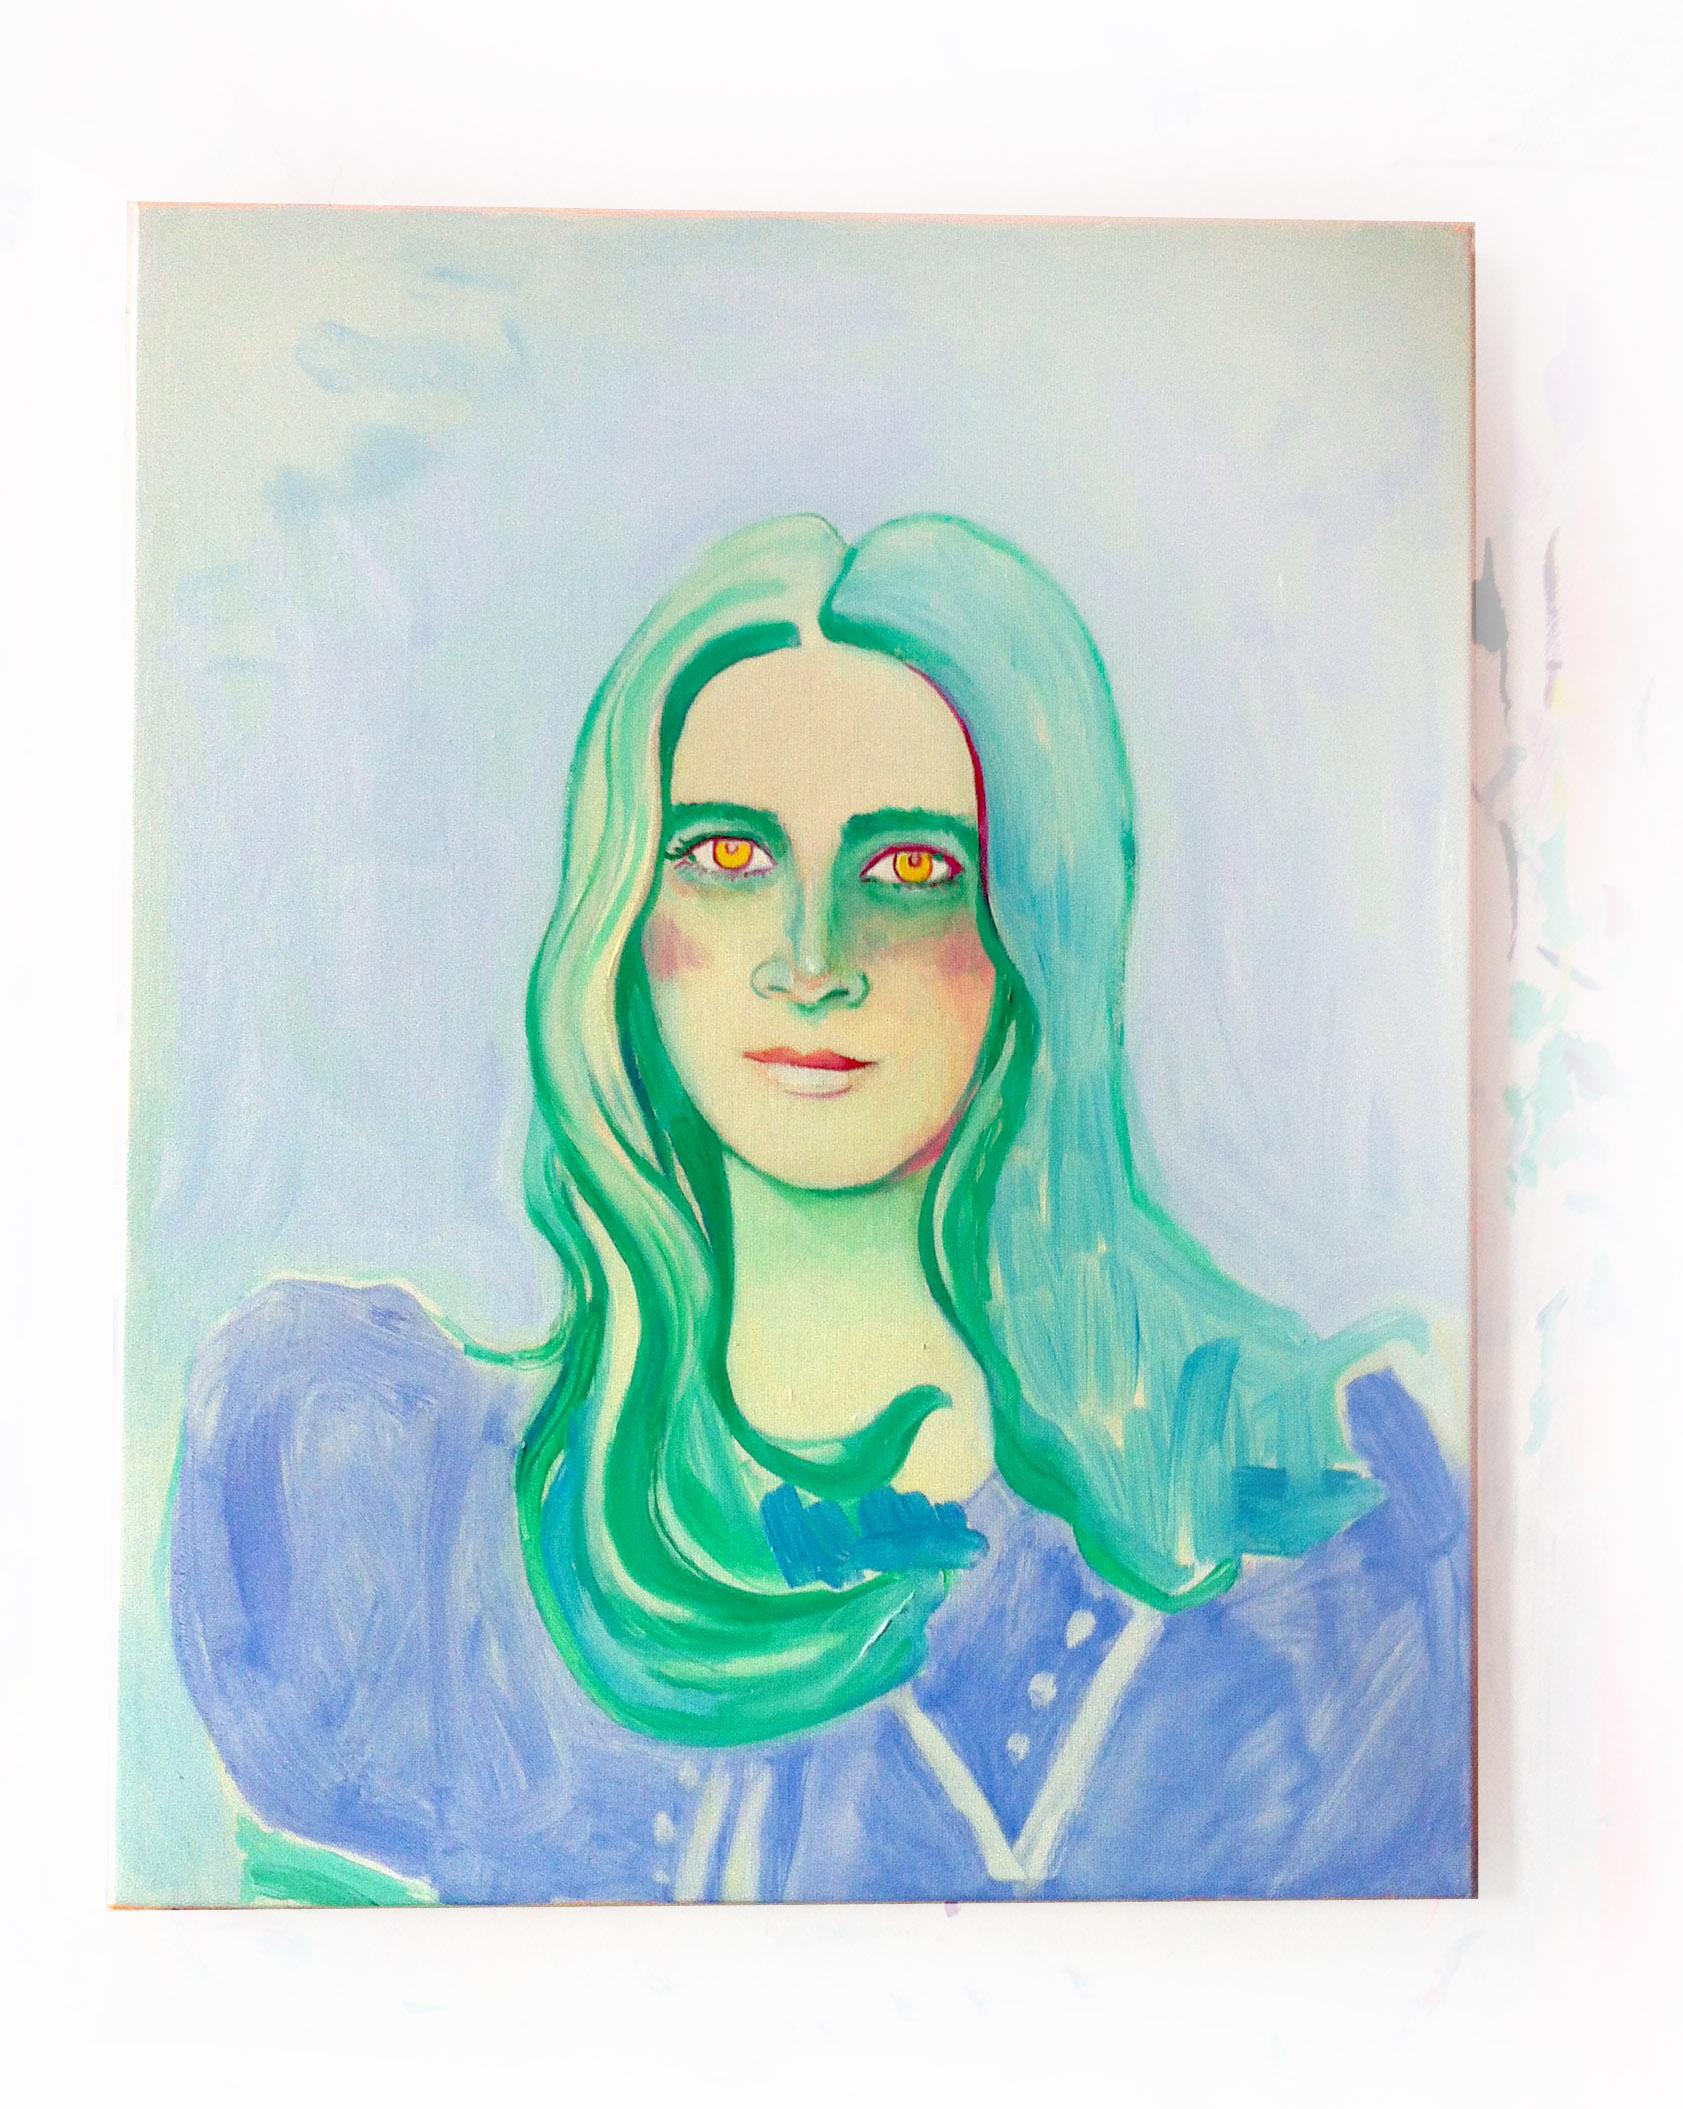 marina, oil on canvas, 20 x 22 in.2014